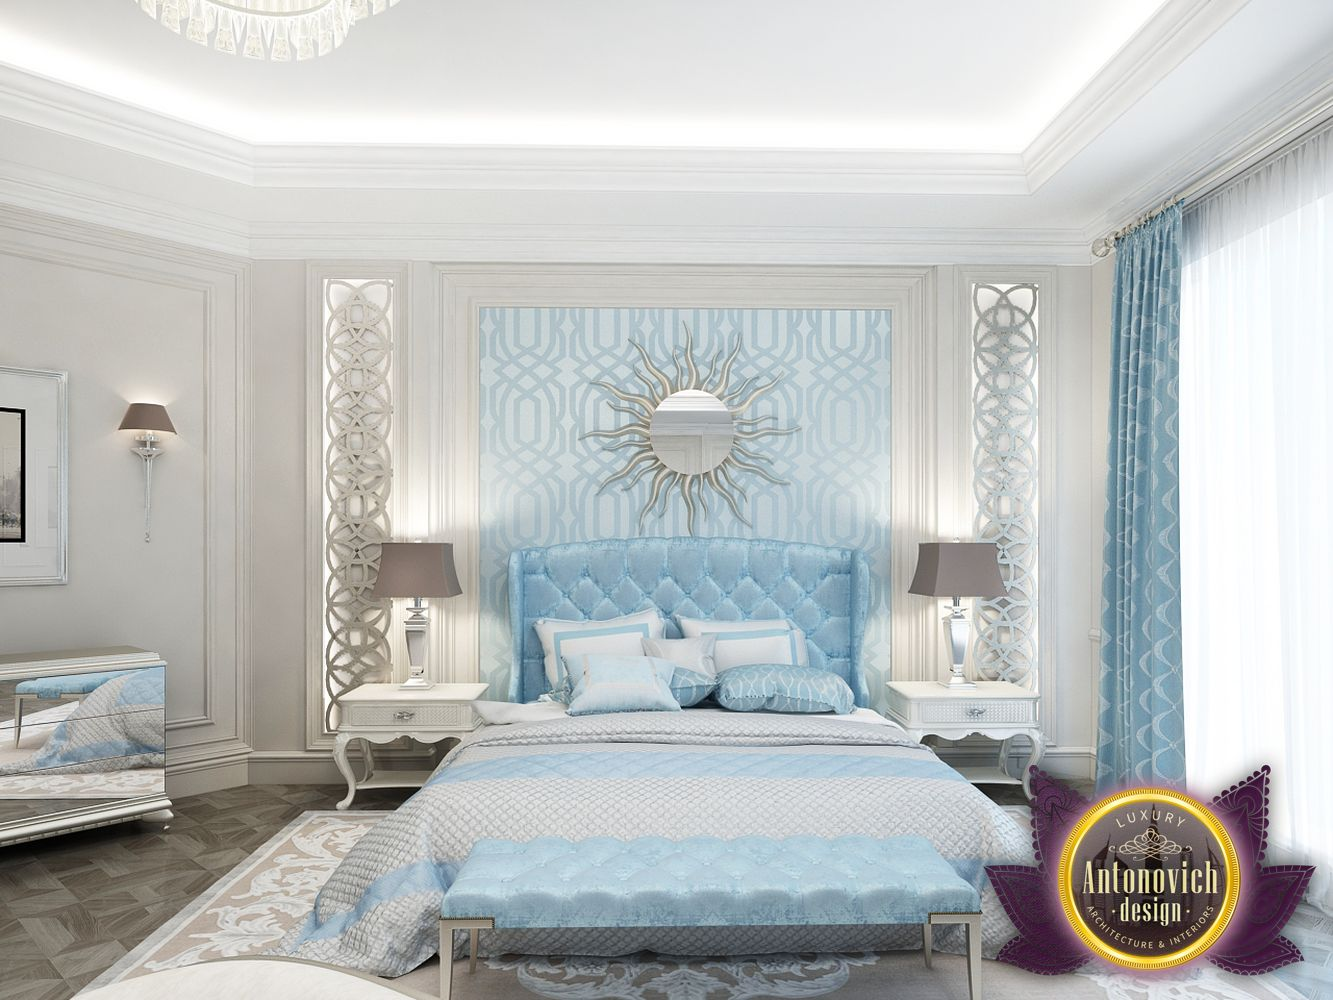 Kenyadesign: Master Bedroom design in Kenya by Luxury Antonovich Design